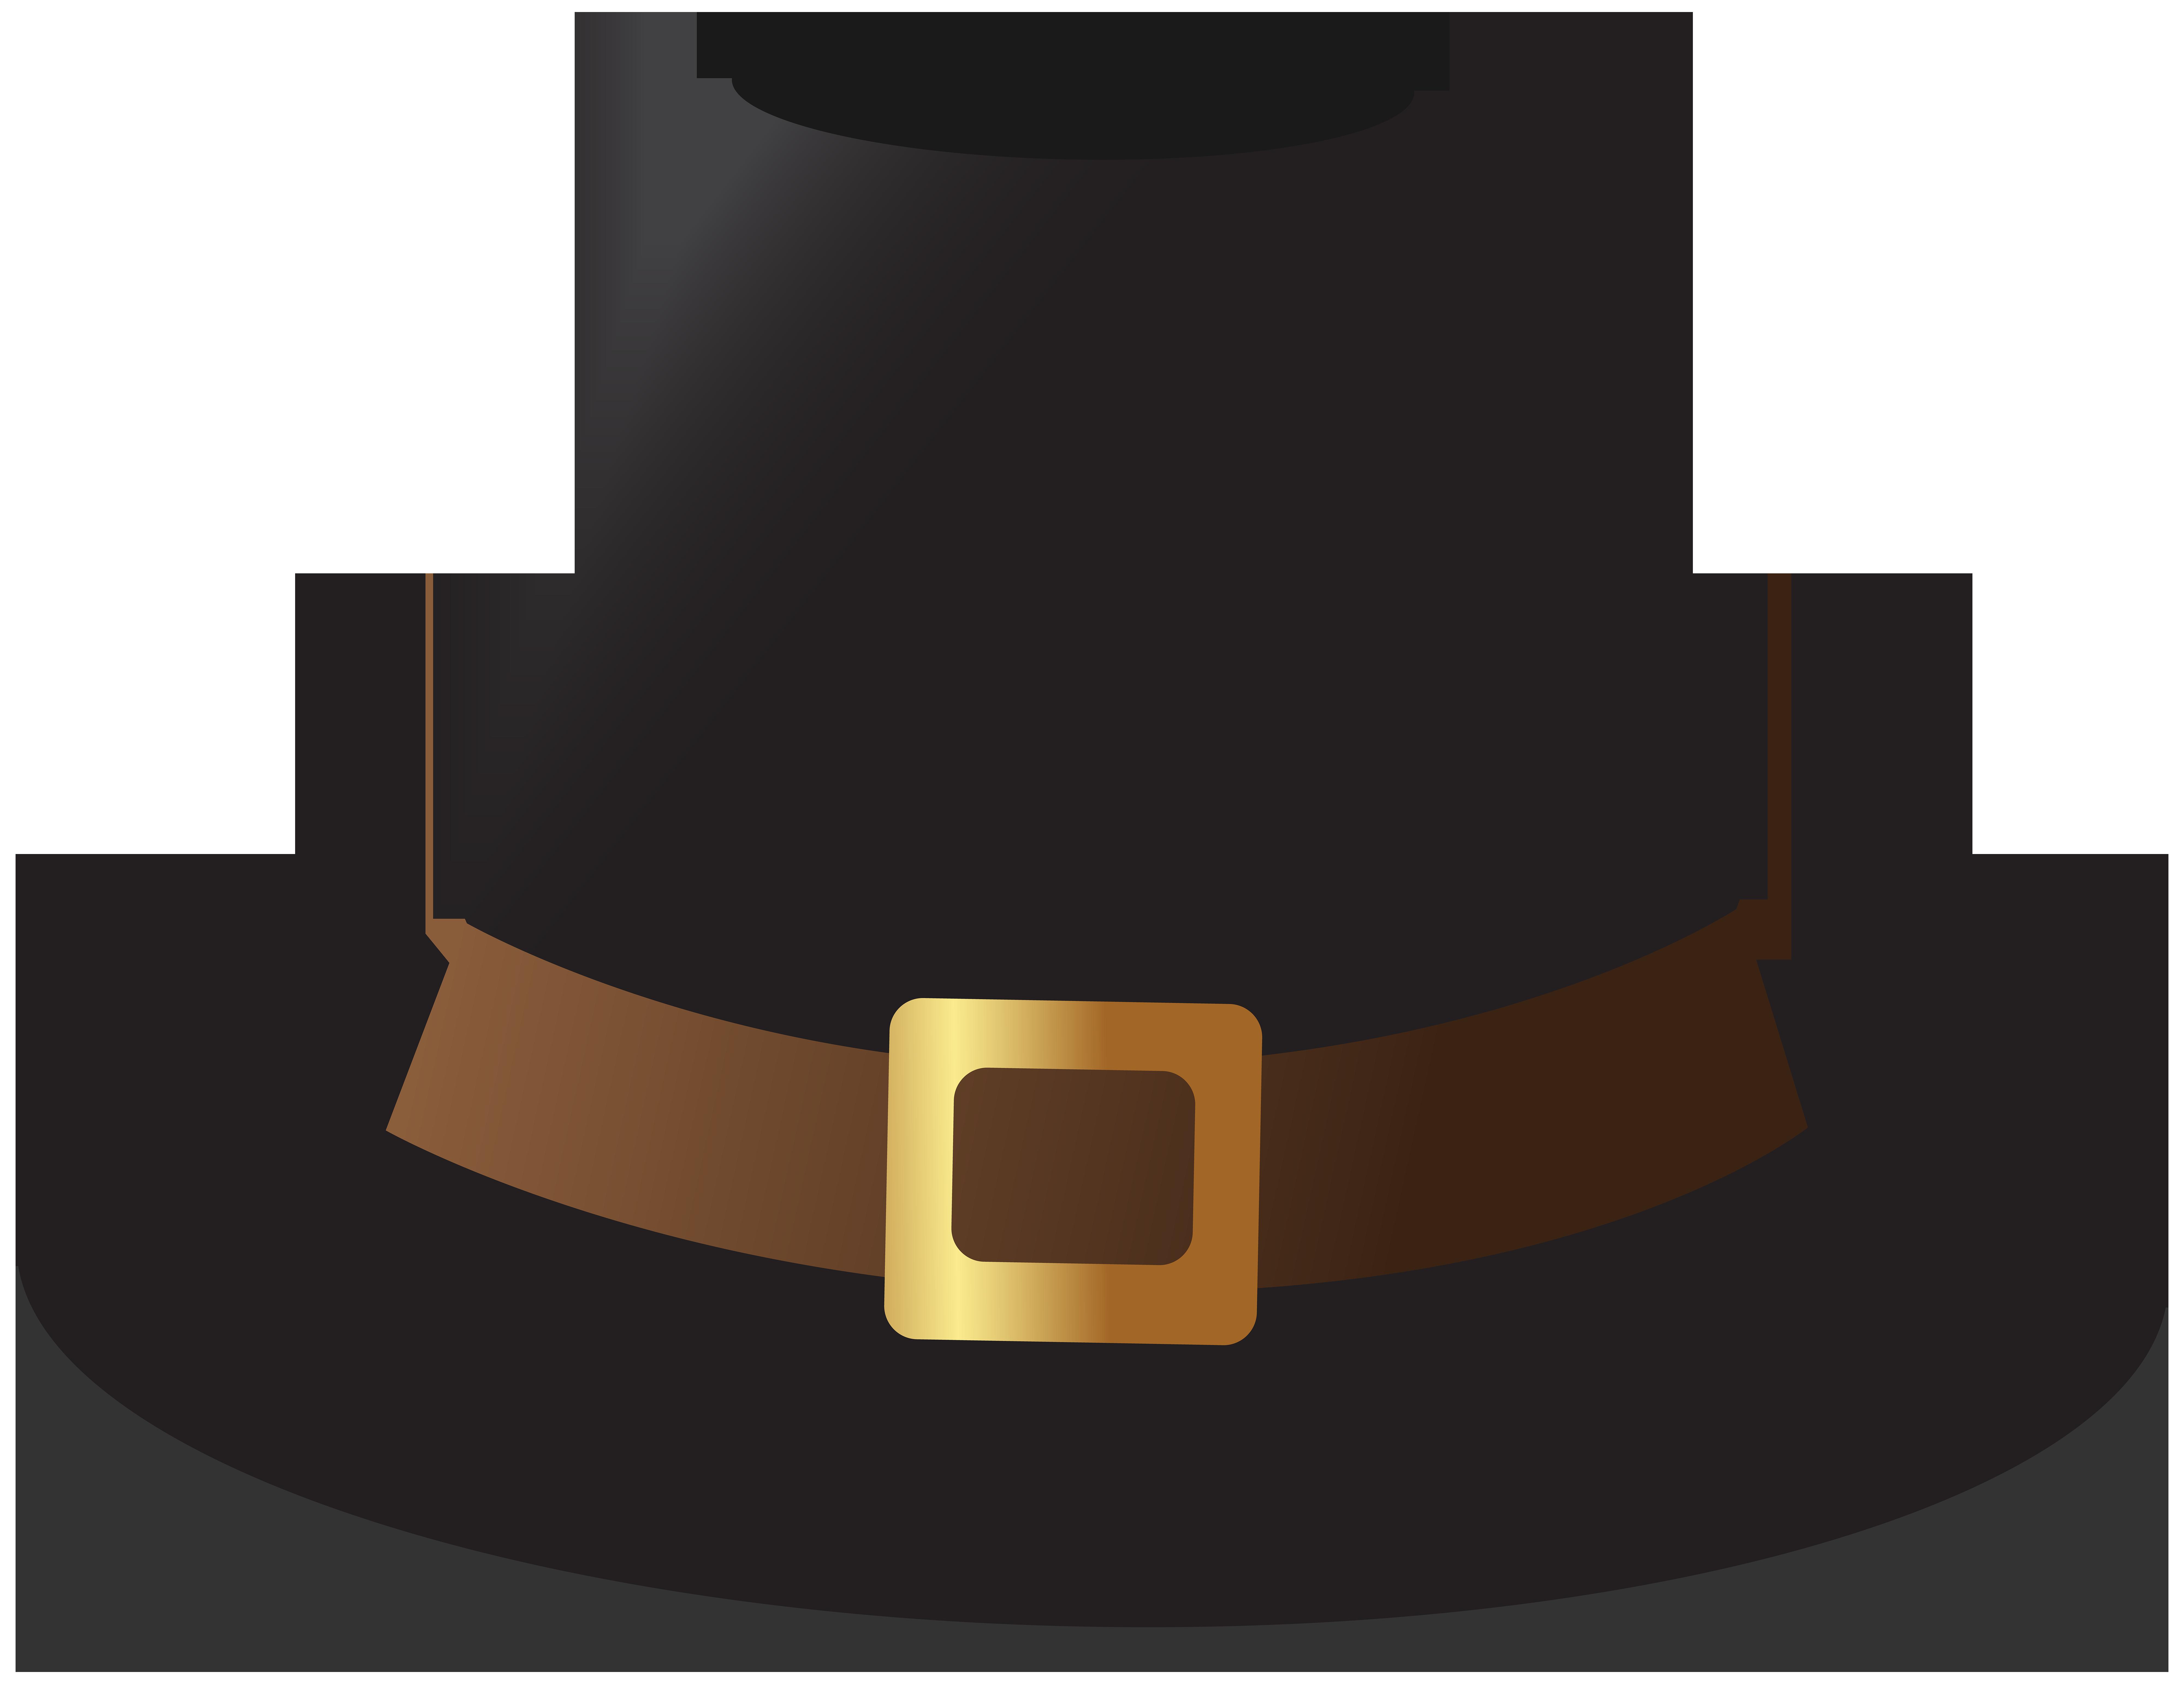 Thanksgiving hat clipart clip art freeuse library Black Pilgrim Hat Transparent PNG Image | Gallery Yopriceville ... clip art freeuse library